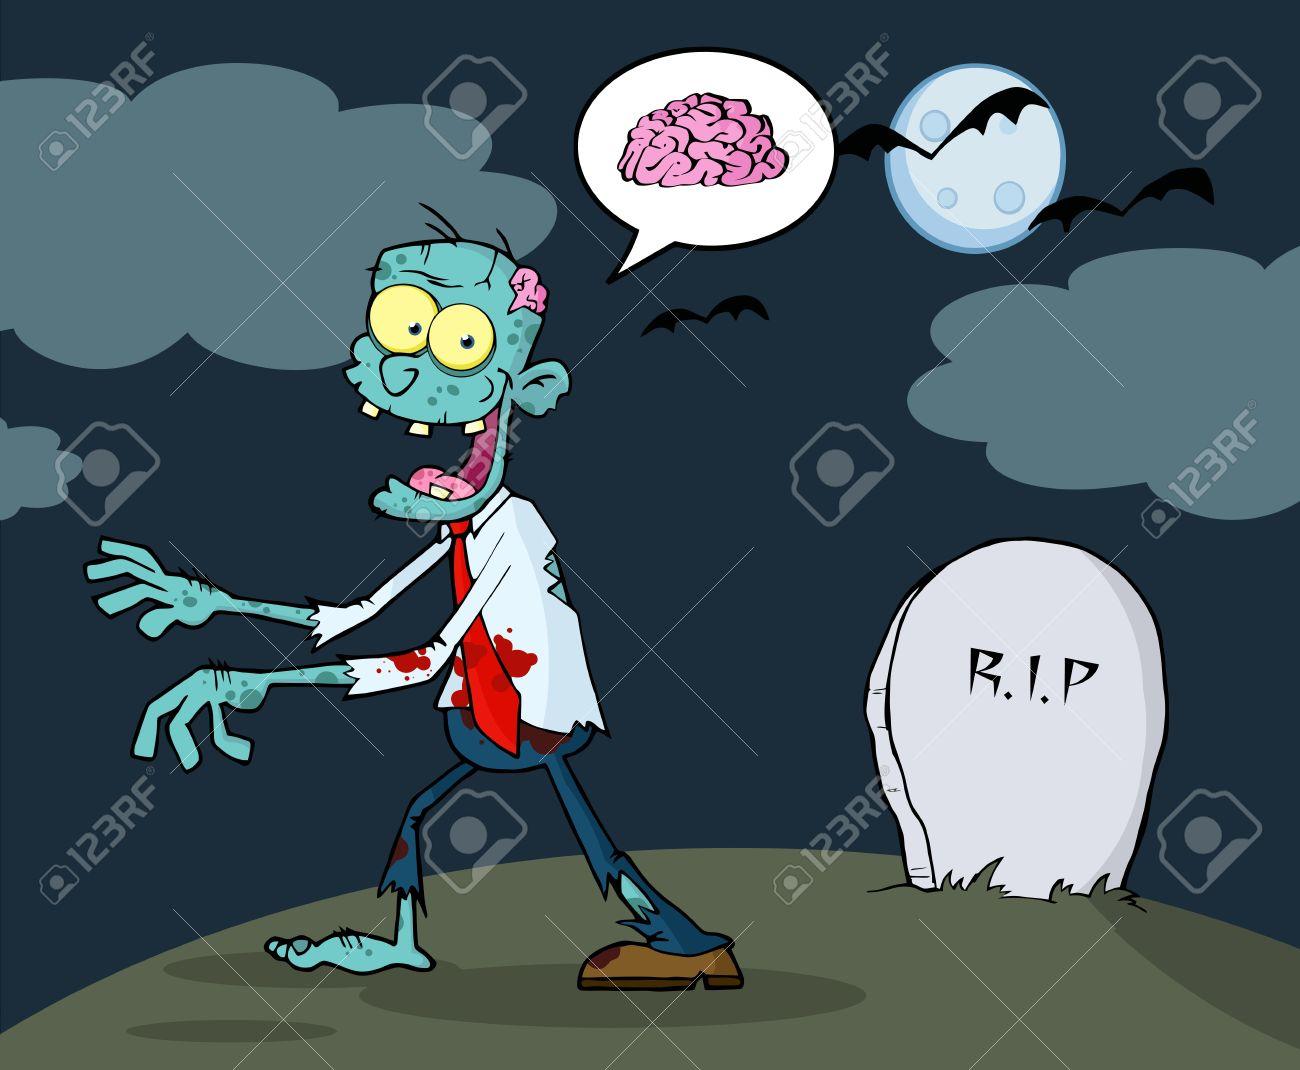 Blue Cartoon Zombie Walking With Hands In Night Stock Vector - 15515027